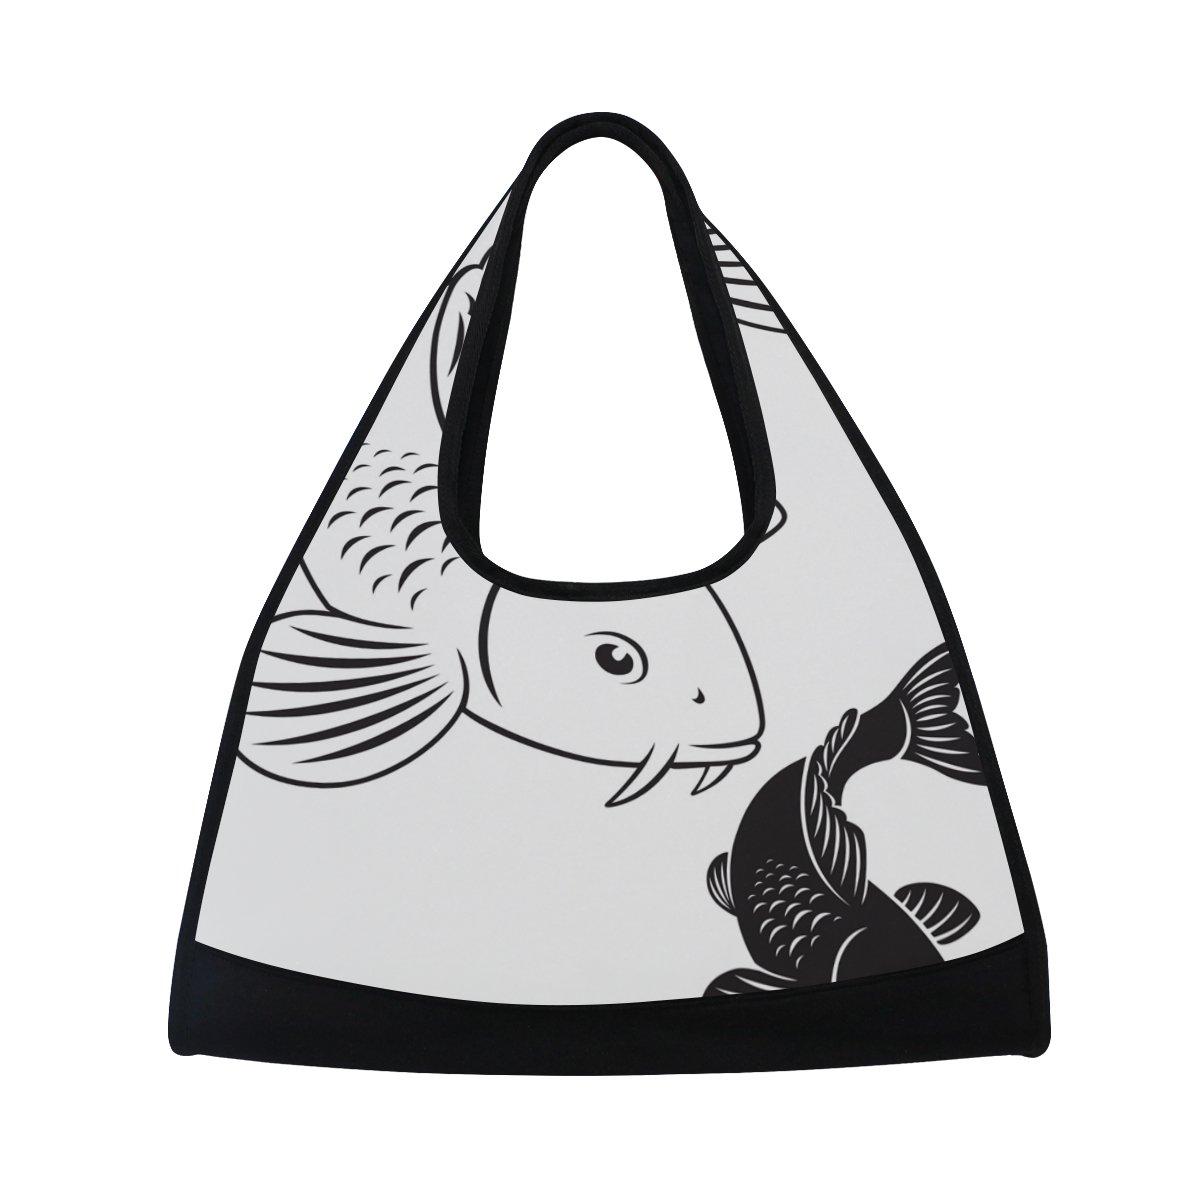 Sport Gym Bag Black And White Koi Fish Canvas Travel Duffel Bag